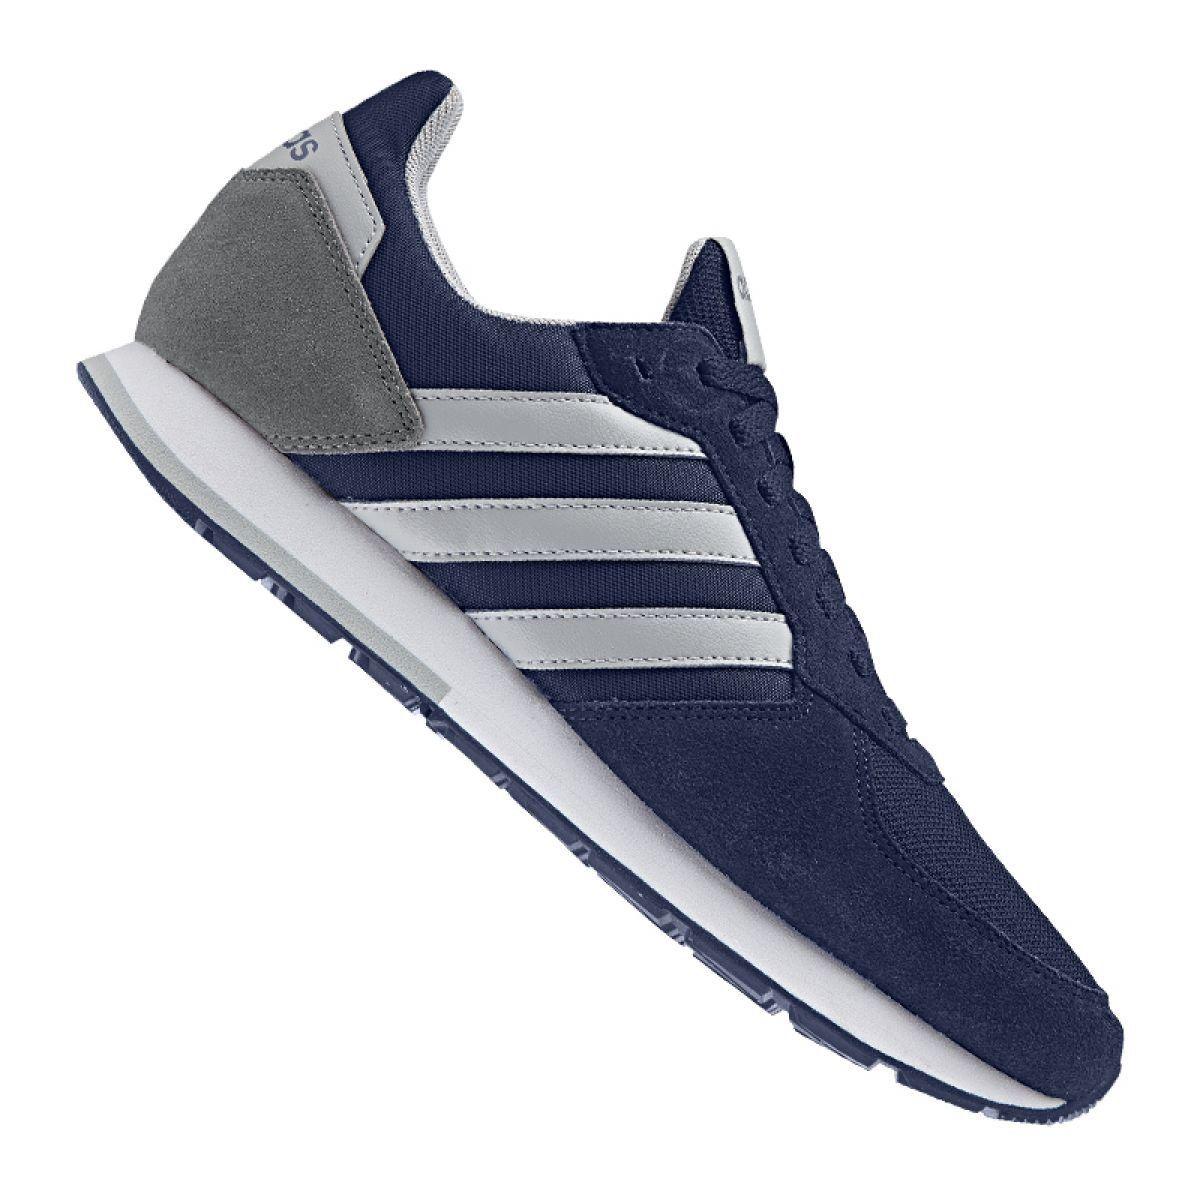 Buty Adidas 8k M B44669 Granatowe Adidas Samba Sneakers Adidas Sneakers Adidas Samba